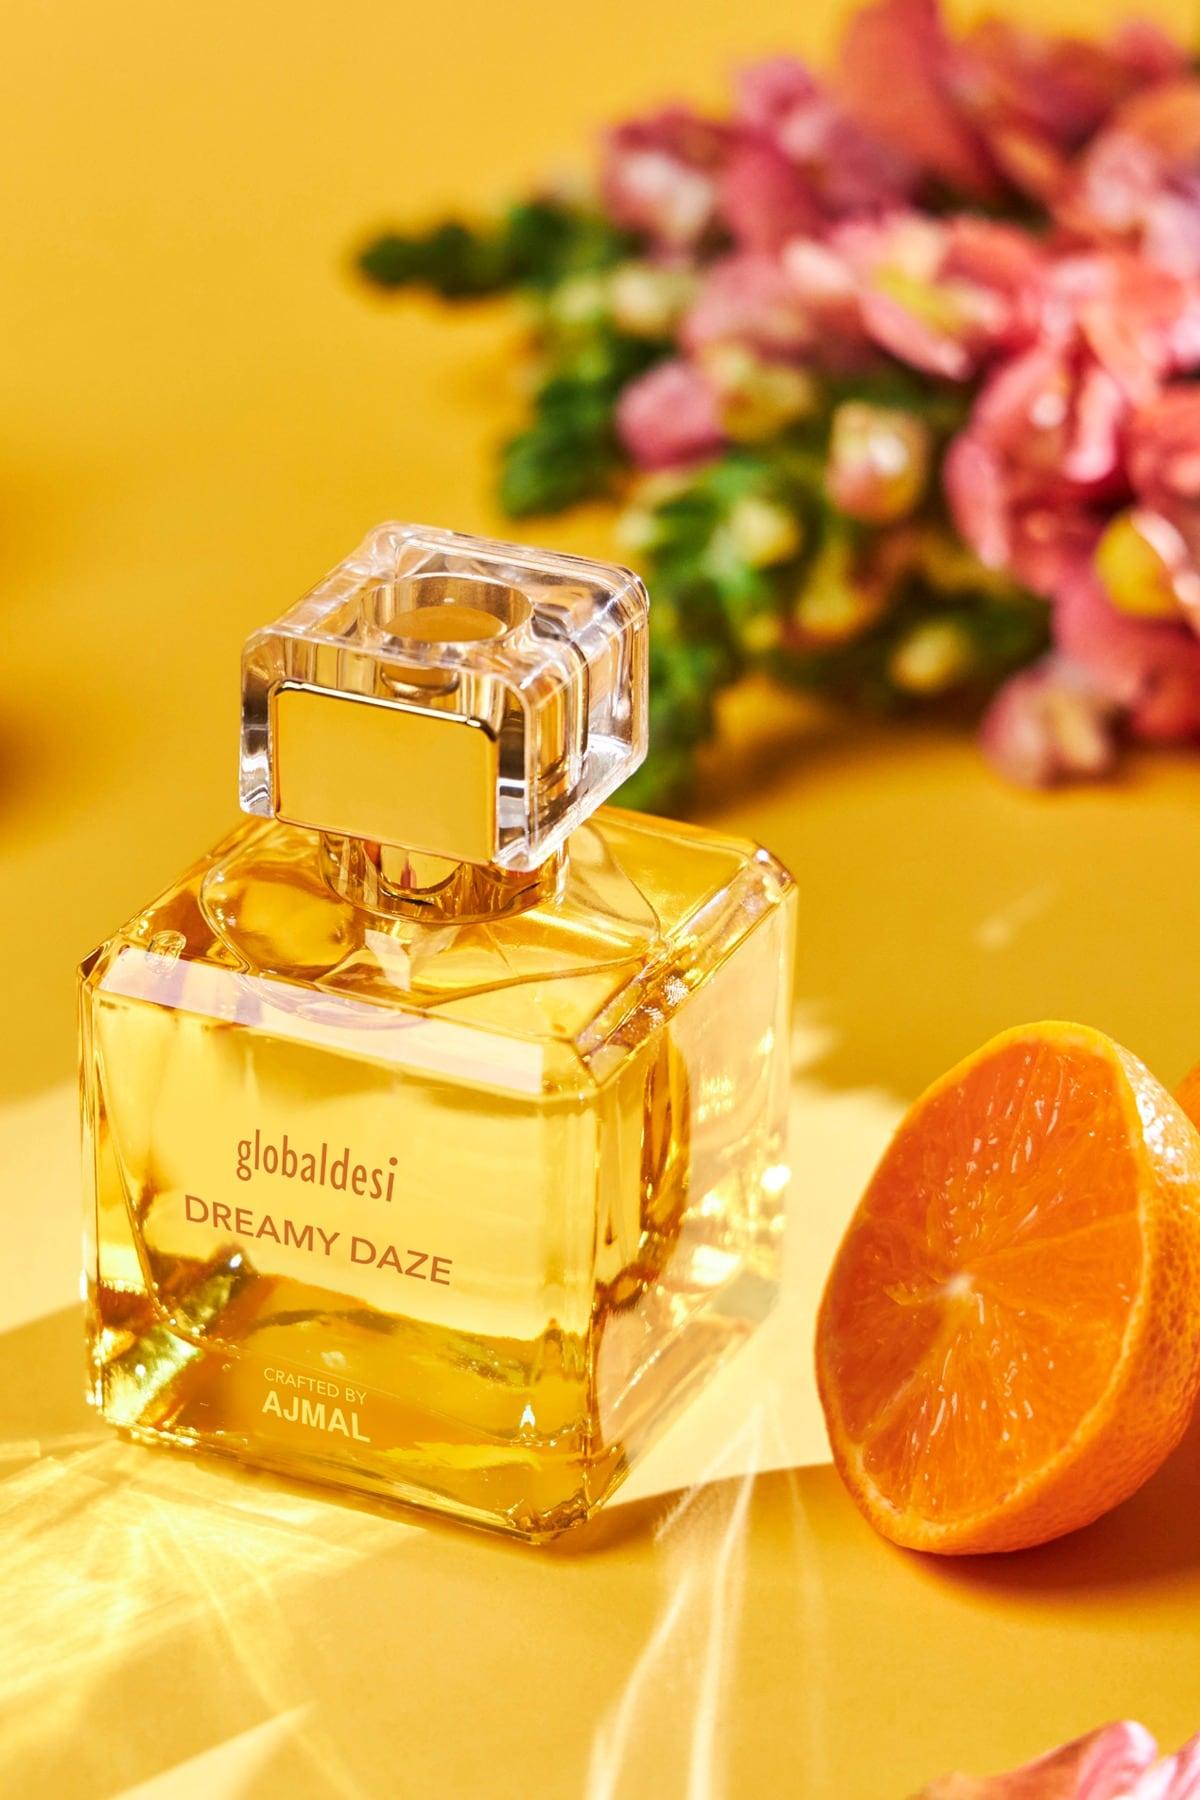 Global Desi | Dreamy Daze Woody Musky Eau De Parfum